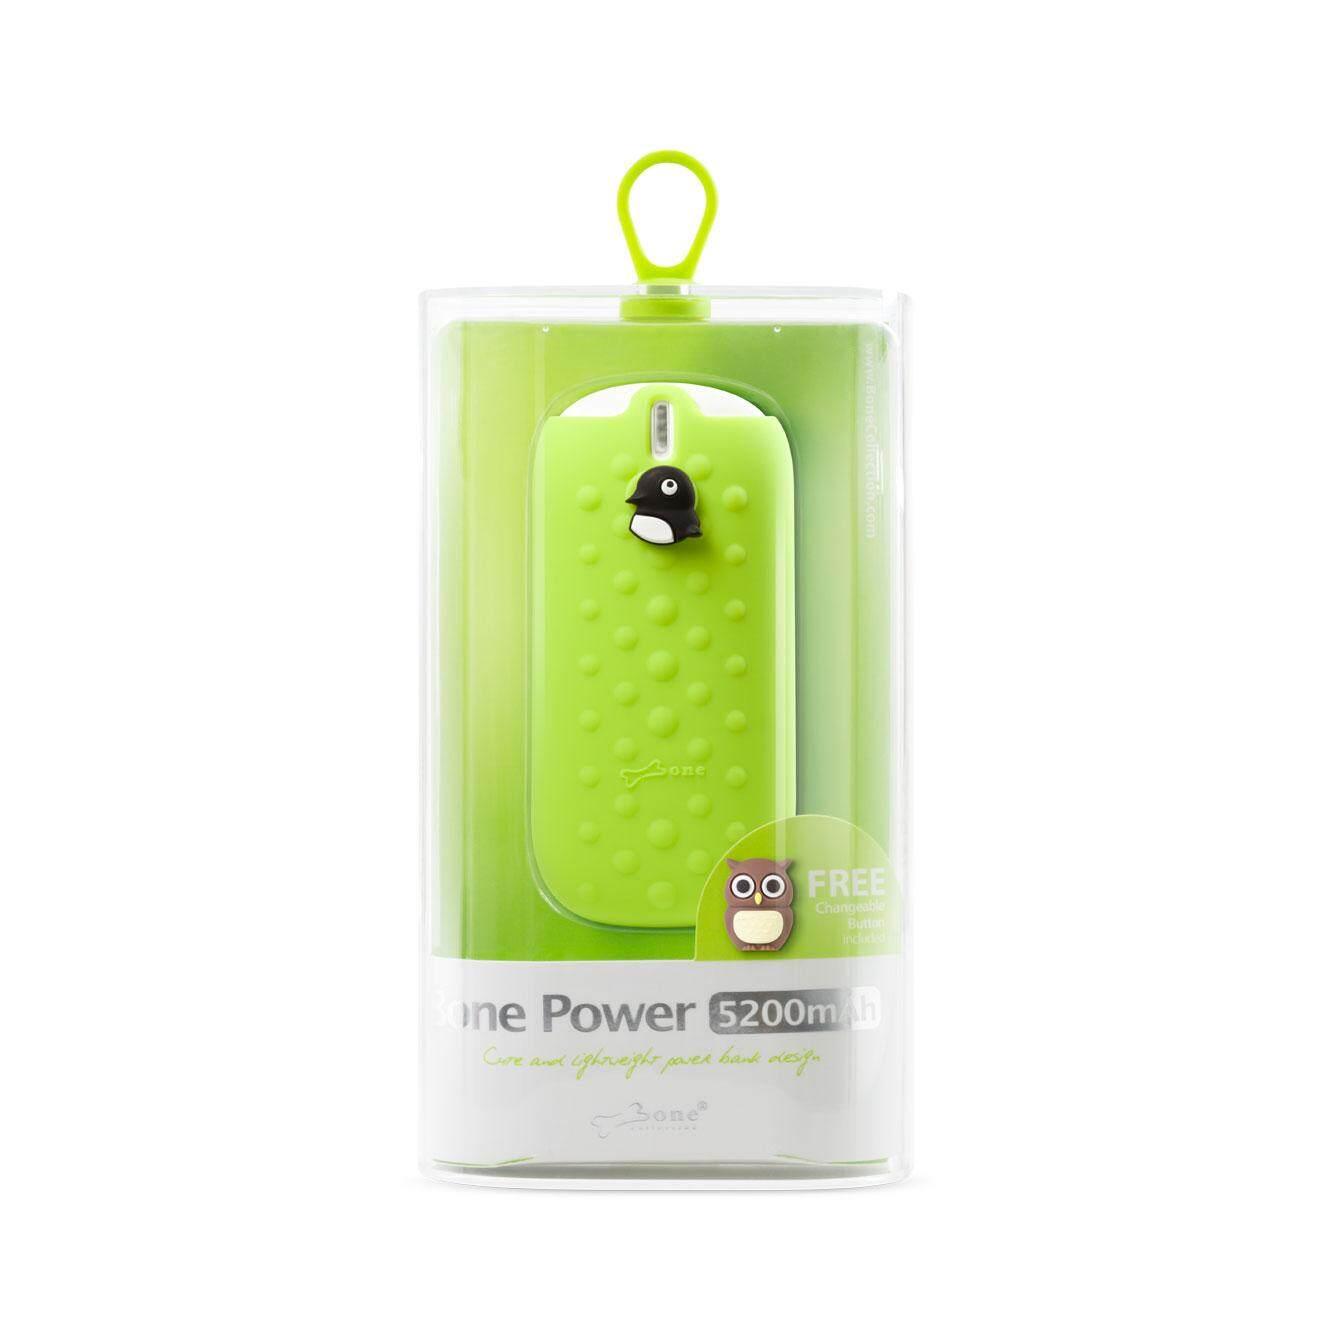 Bone Collection Power Bank 5200mAh